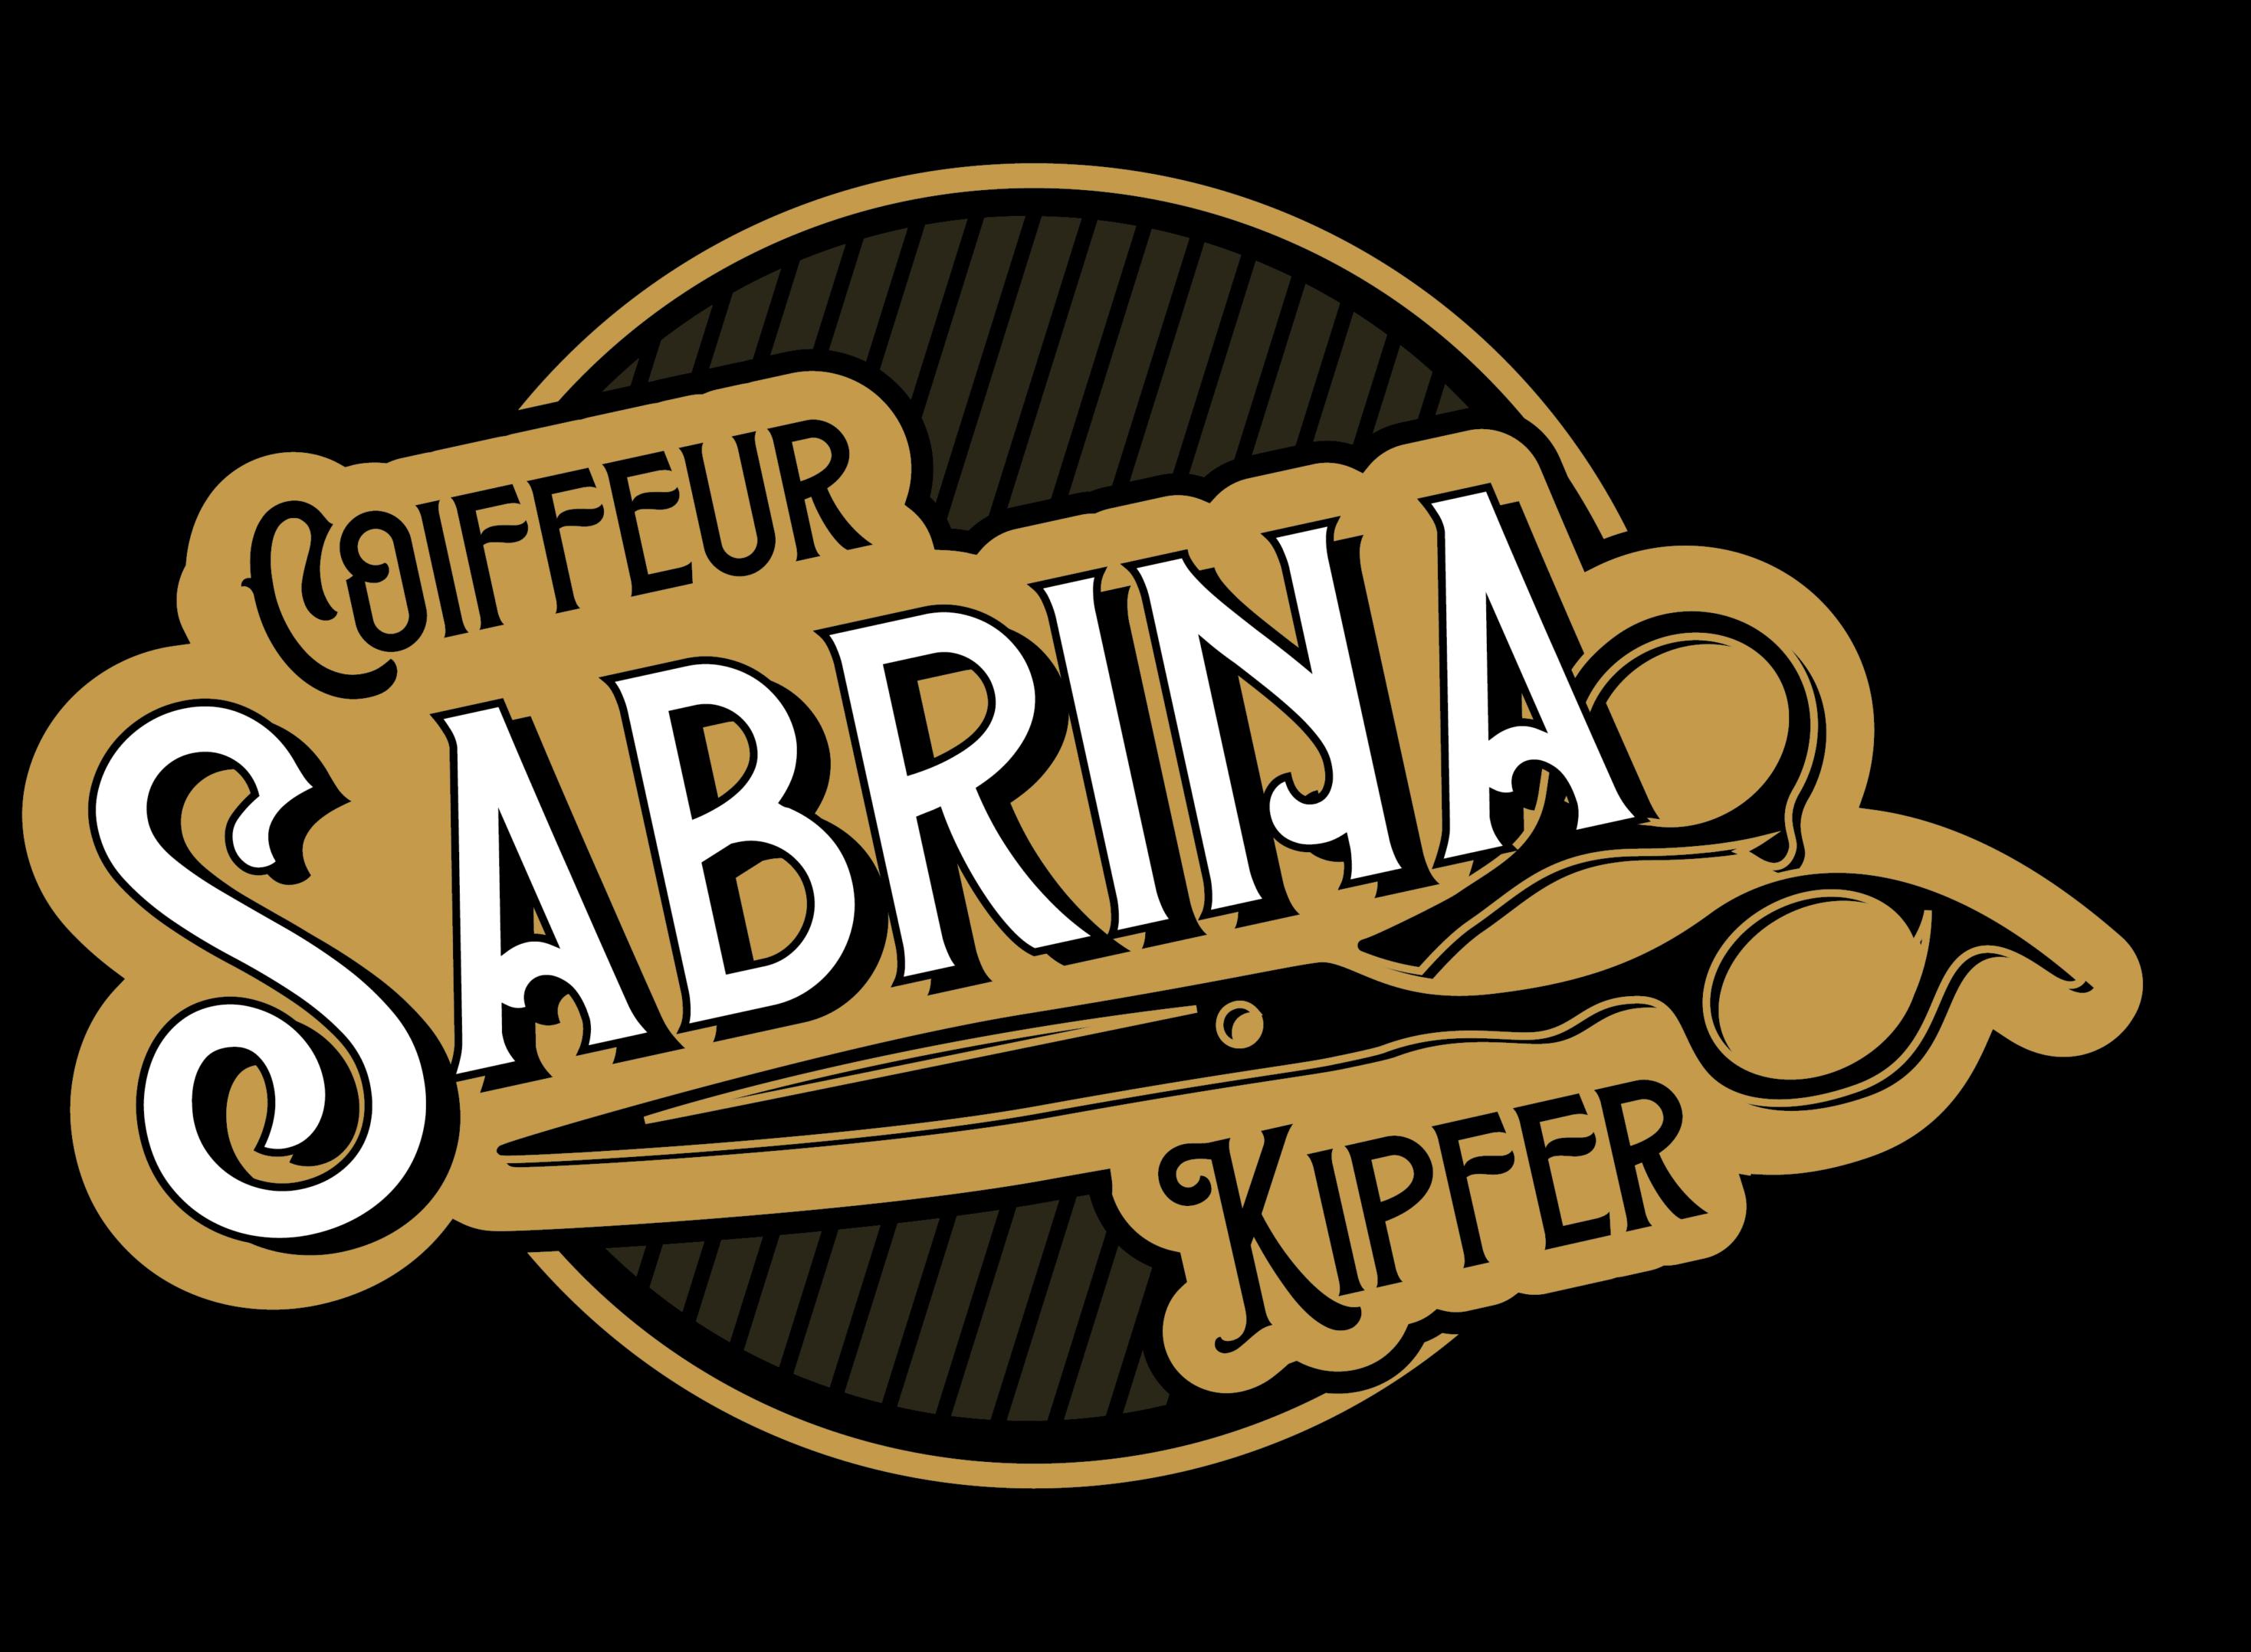 Coiffeur Sabrina